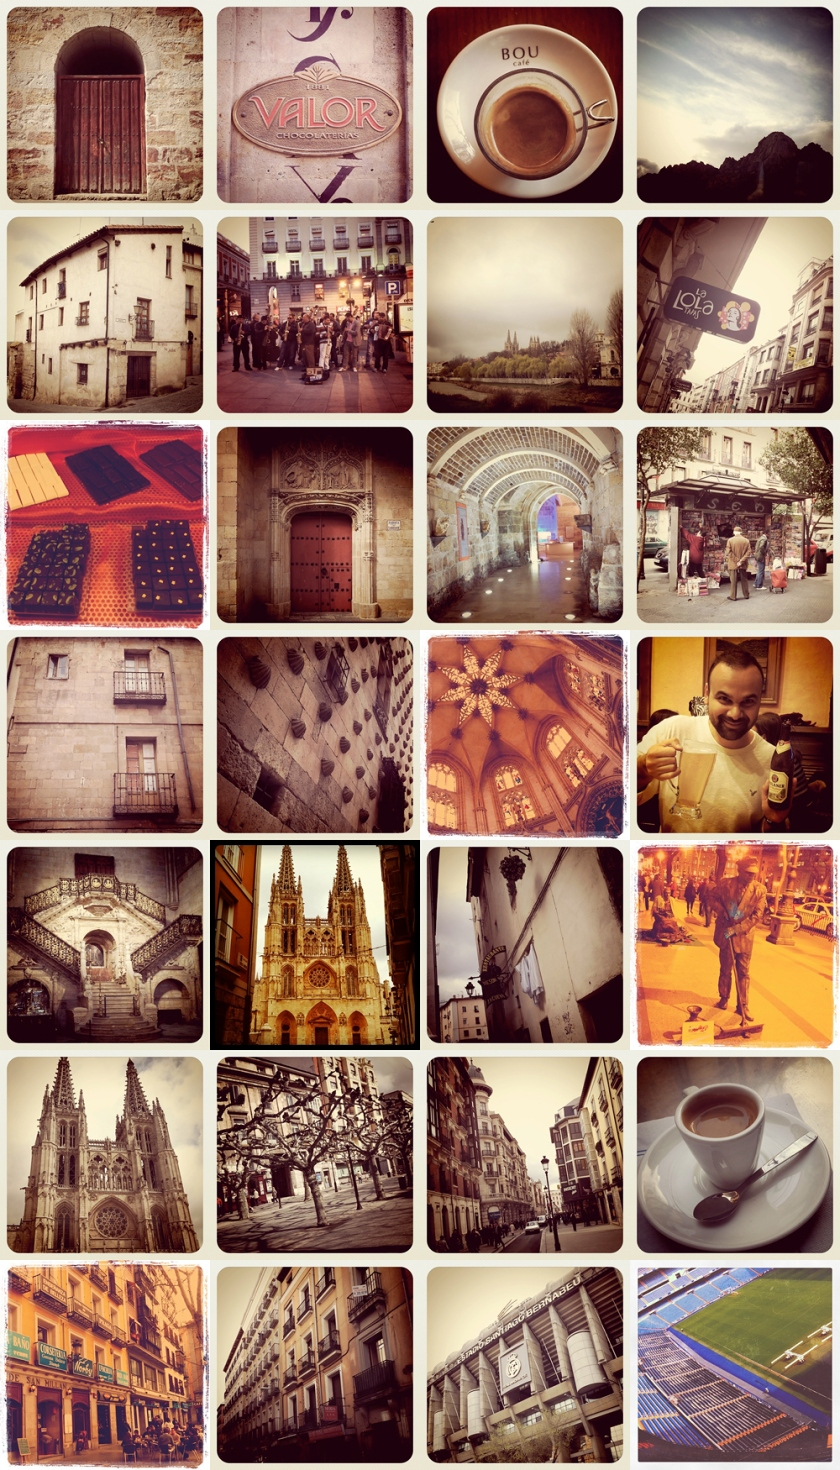 Madrid, Burgos, Salamanca, Valladolid